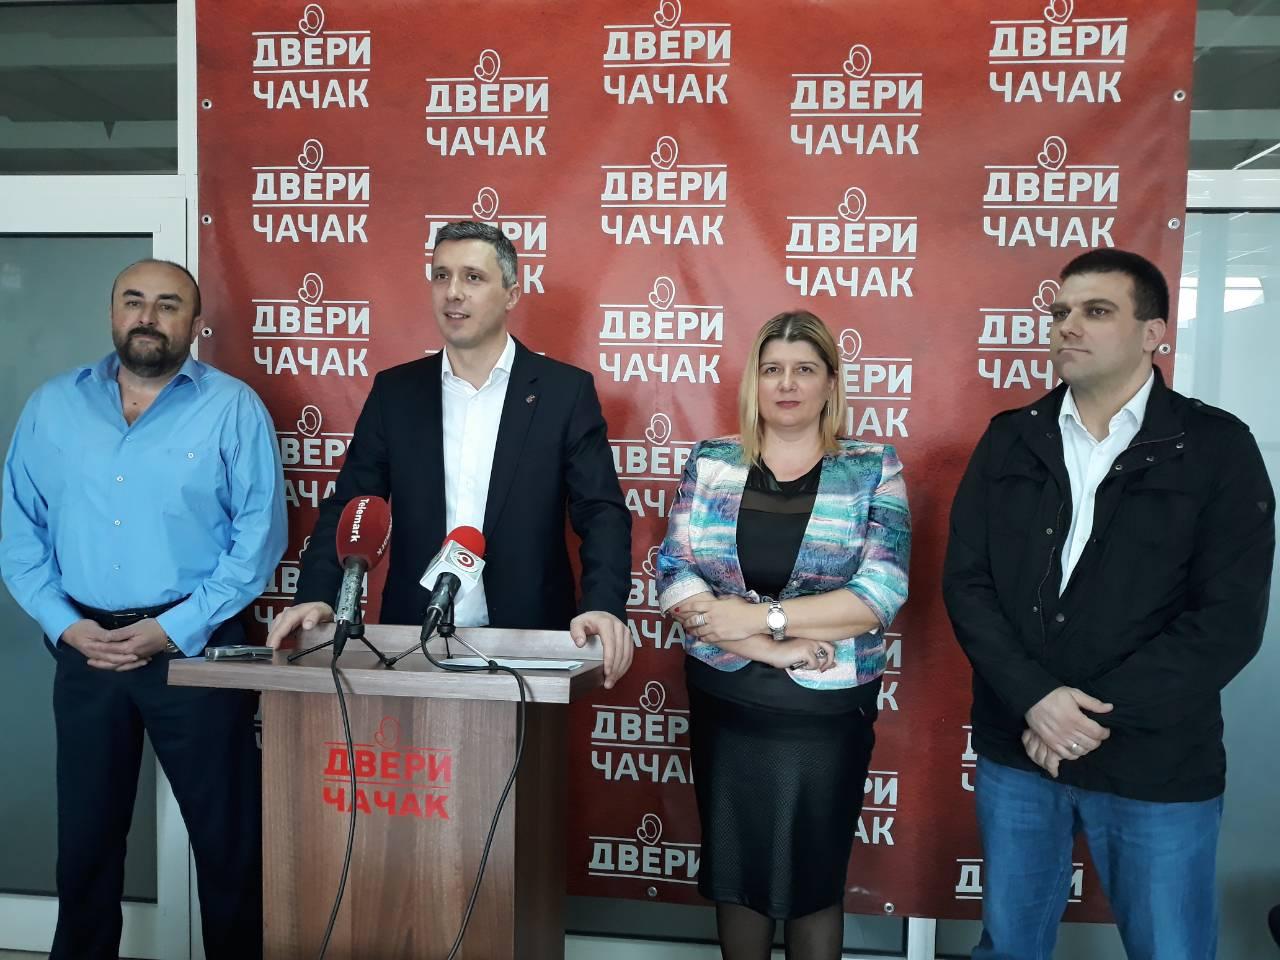 Predstavljeni novi članovi Predsedništva Dveri iz zapadne Srbije